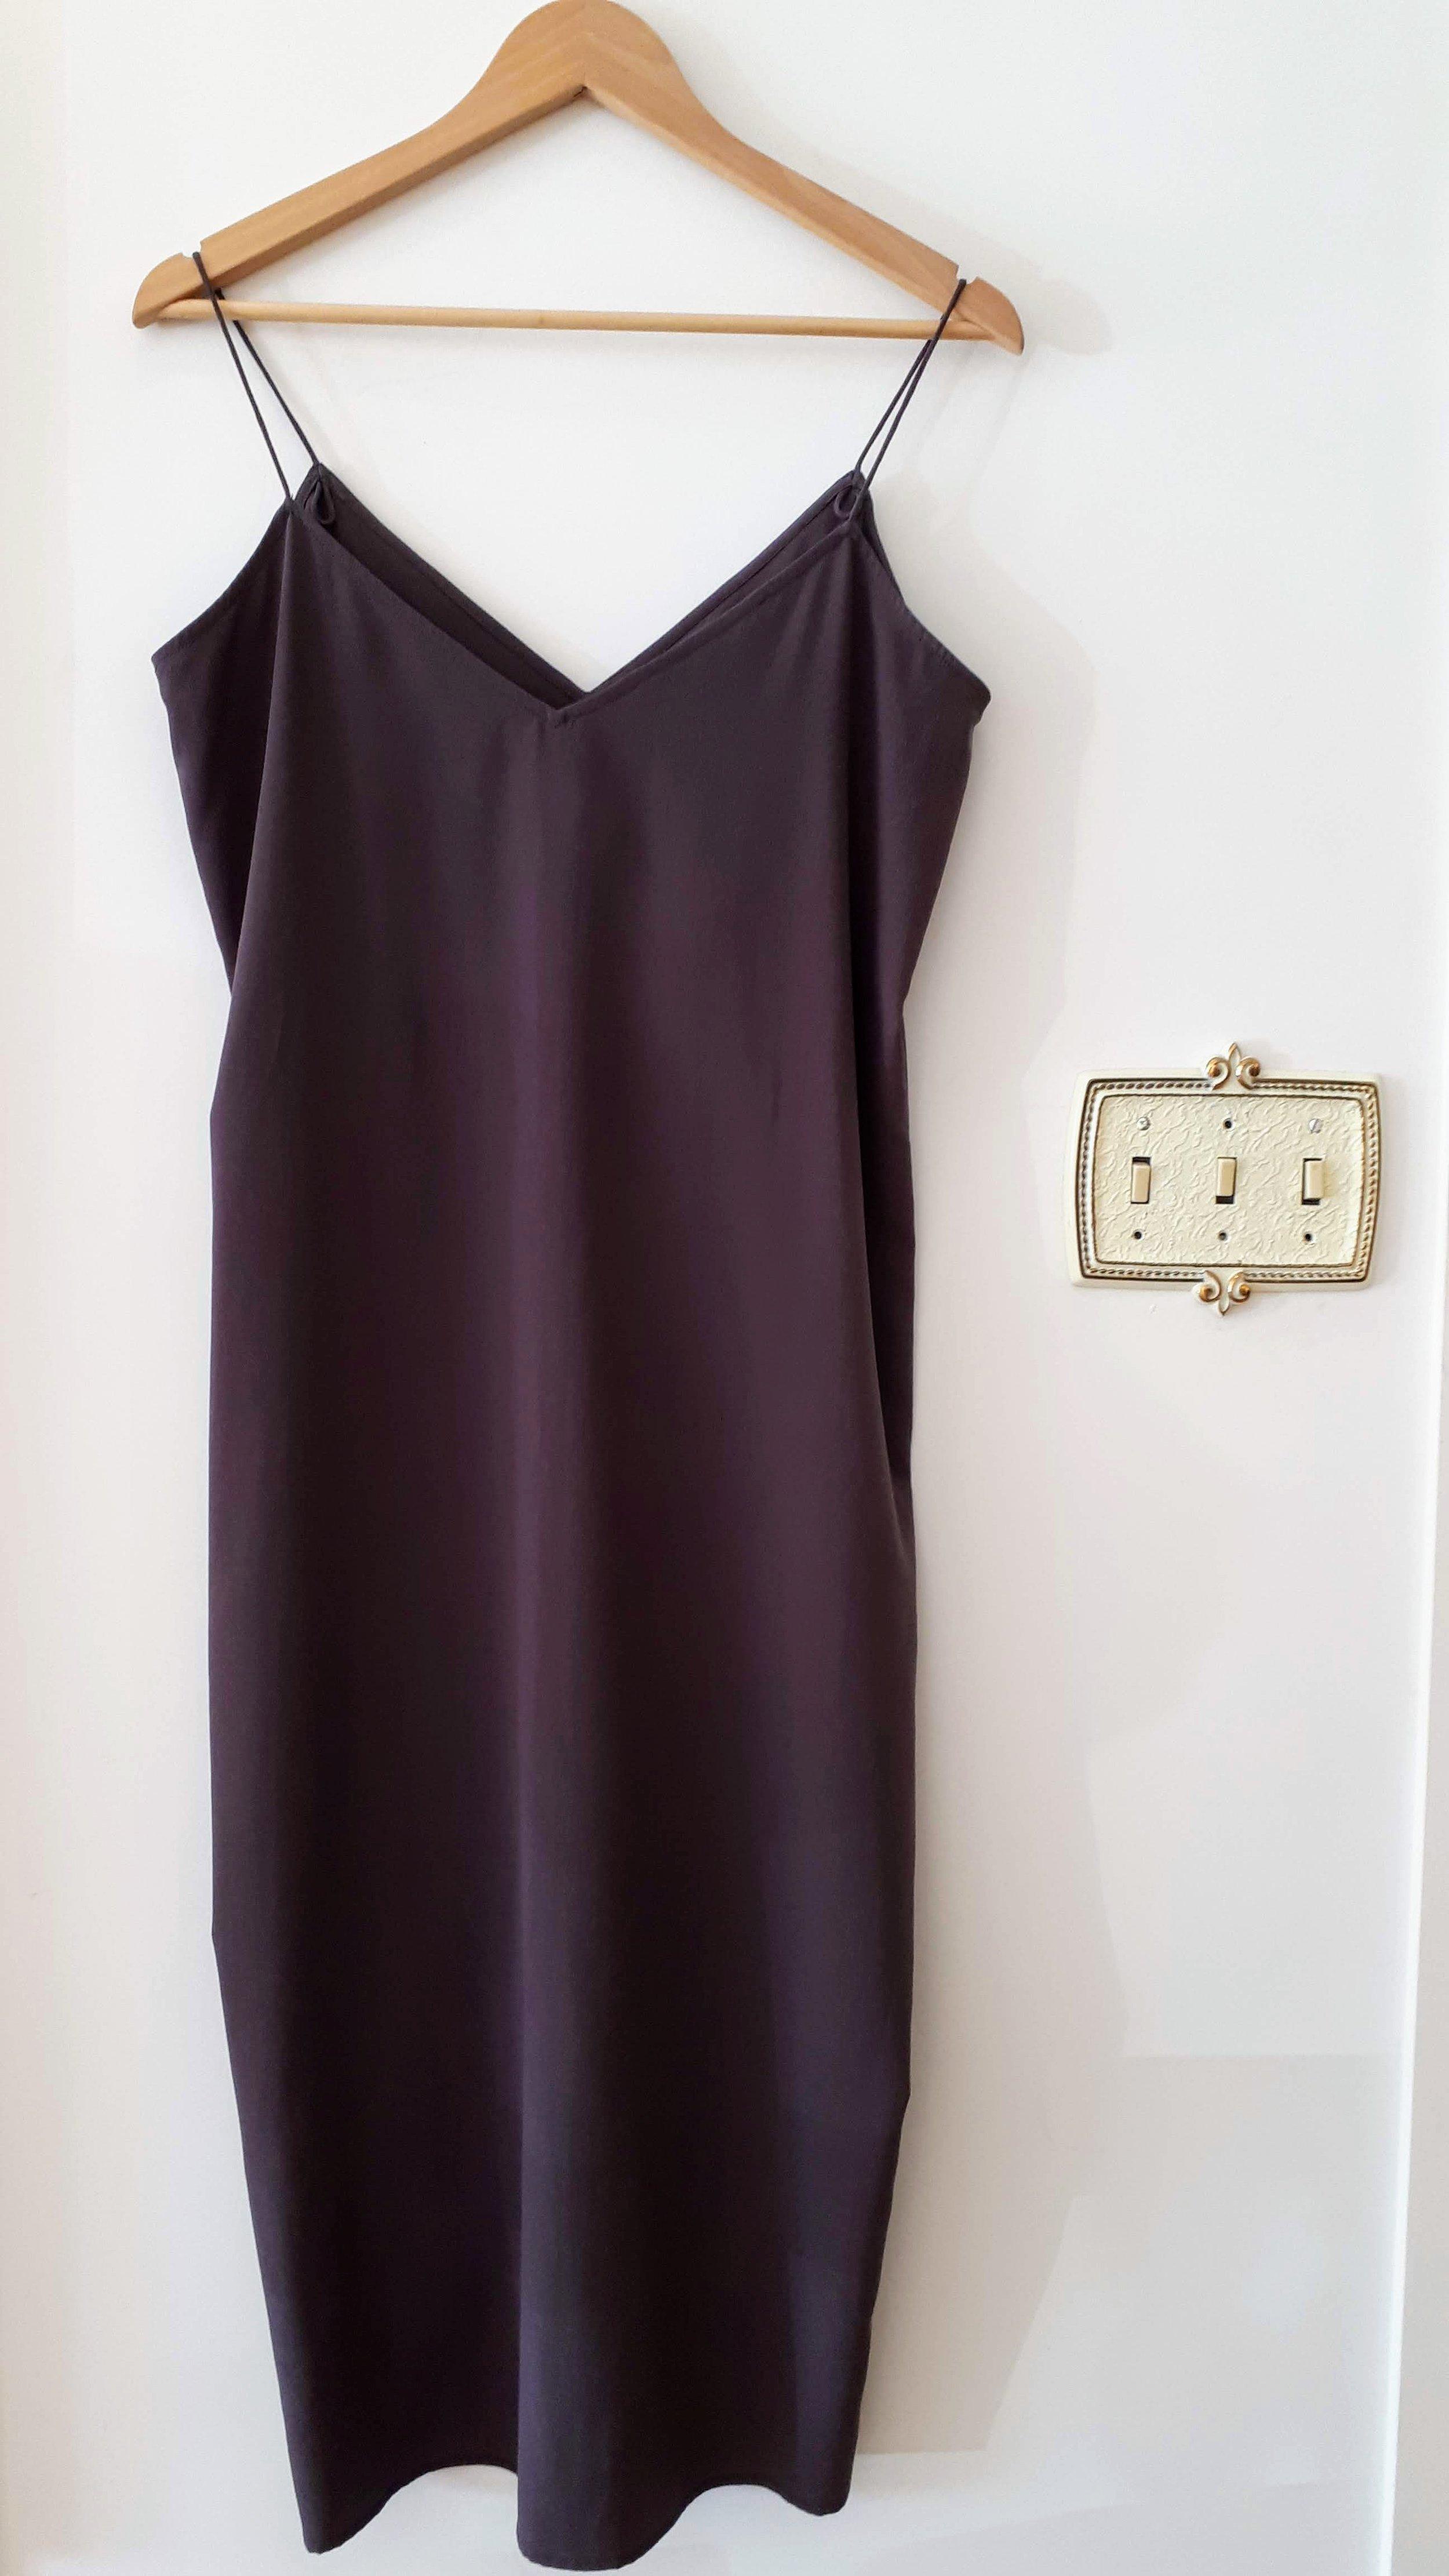 Oak + Fort dress; Size L, $40